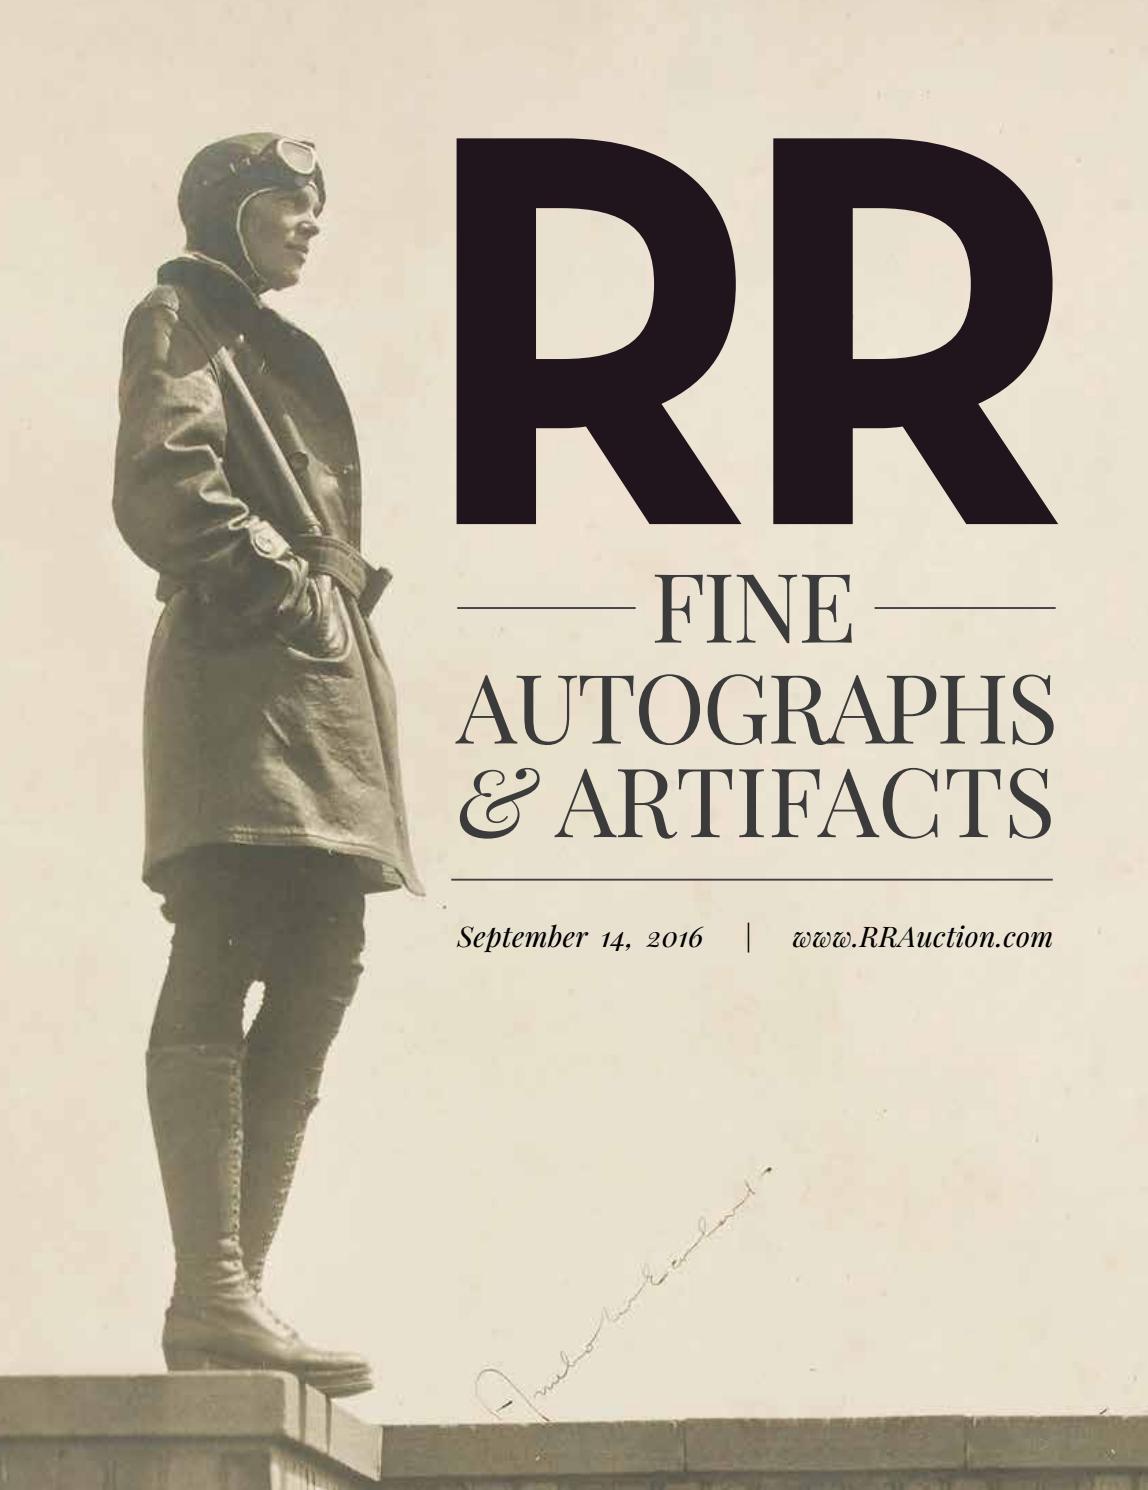 Rr Autograph Auctions Consignment Agreement: RR Auction: Fine Autograph And Artifact Auction September